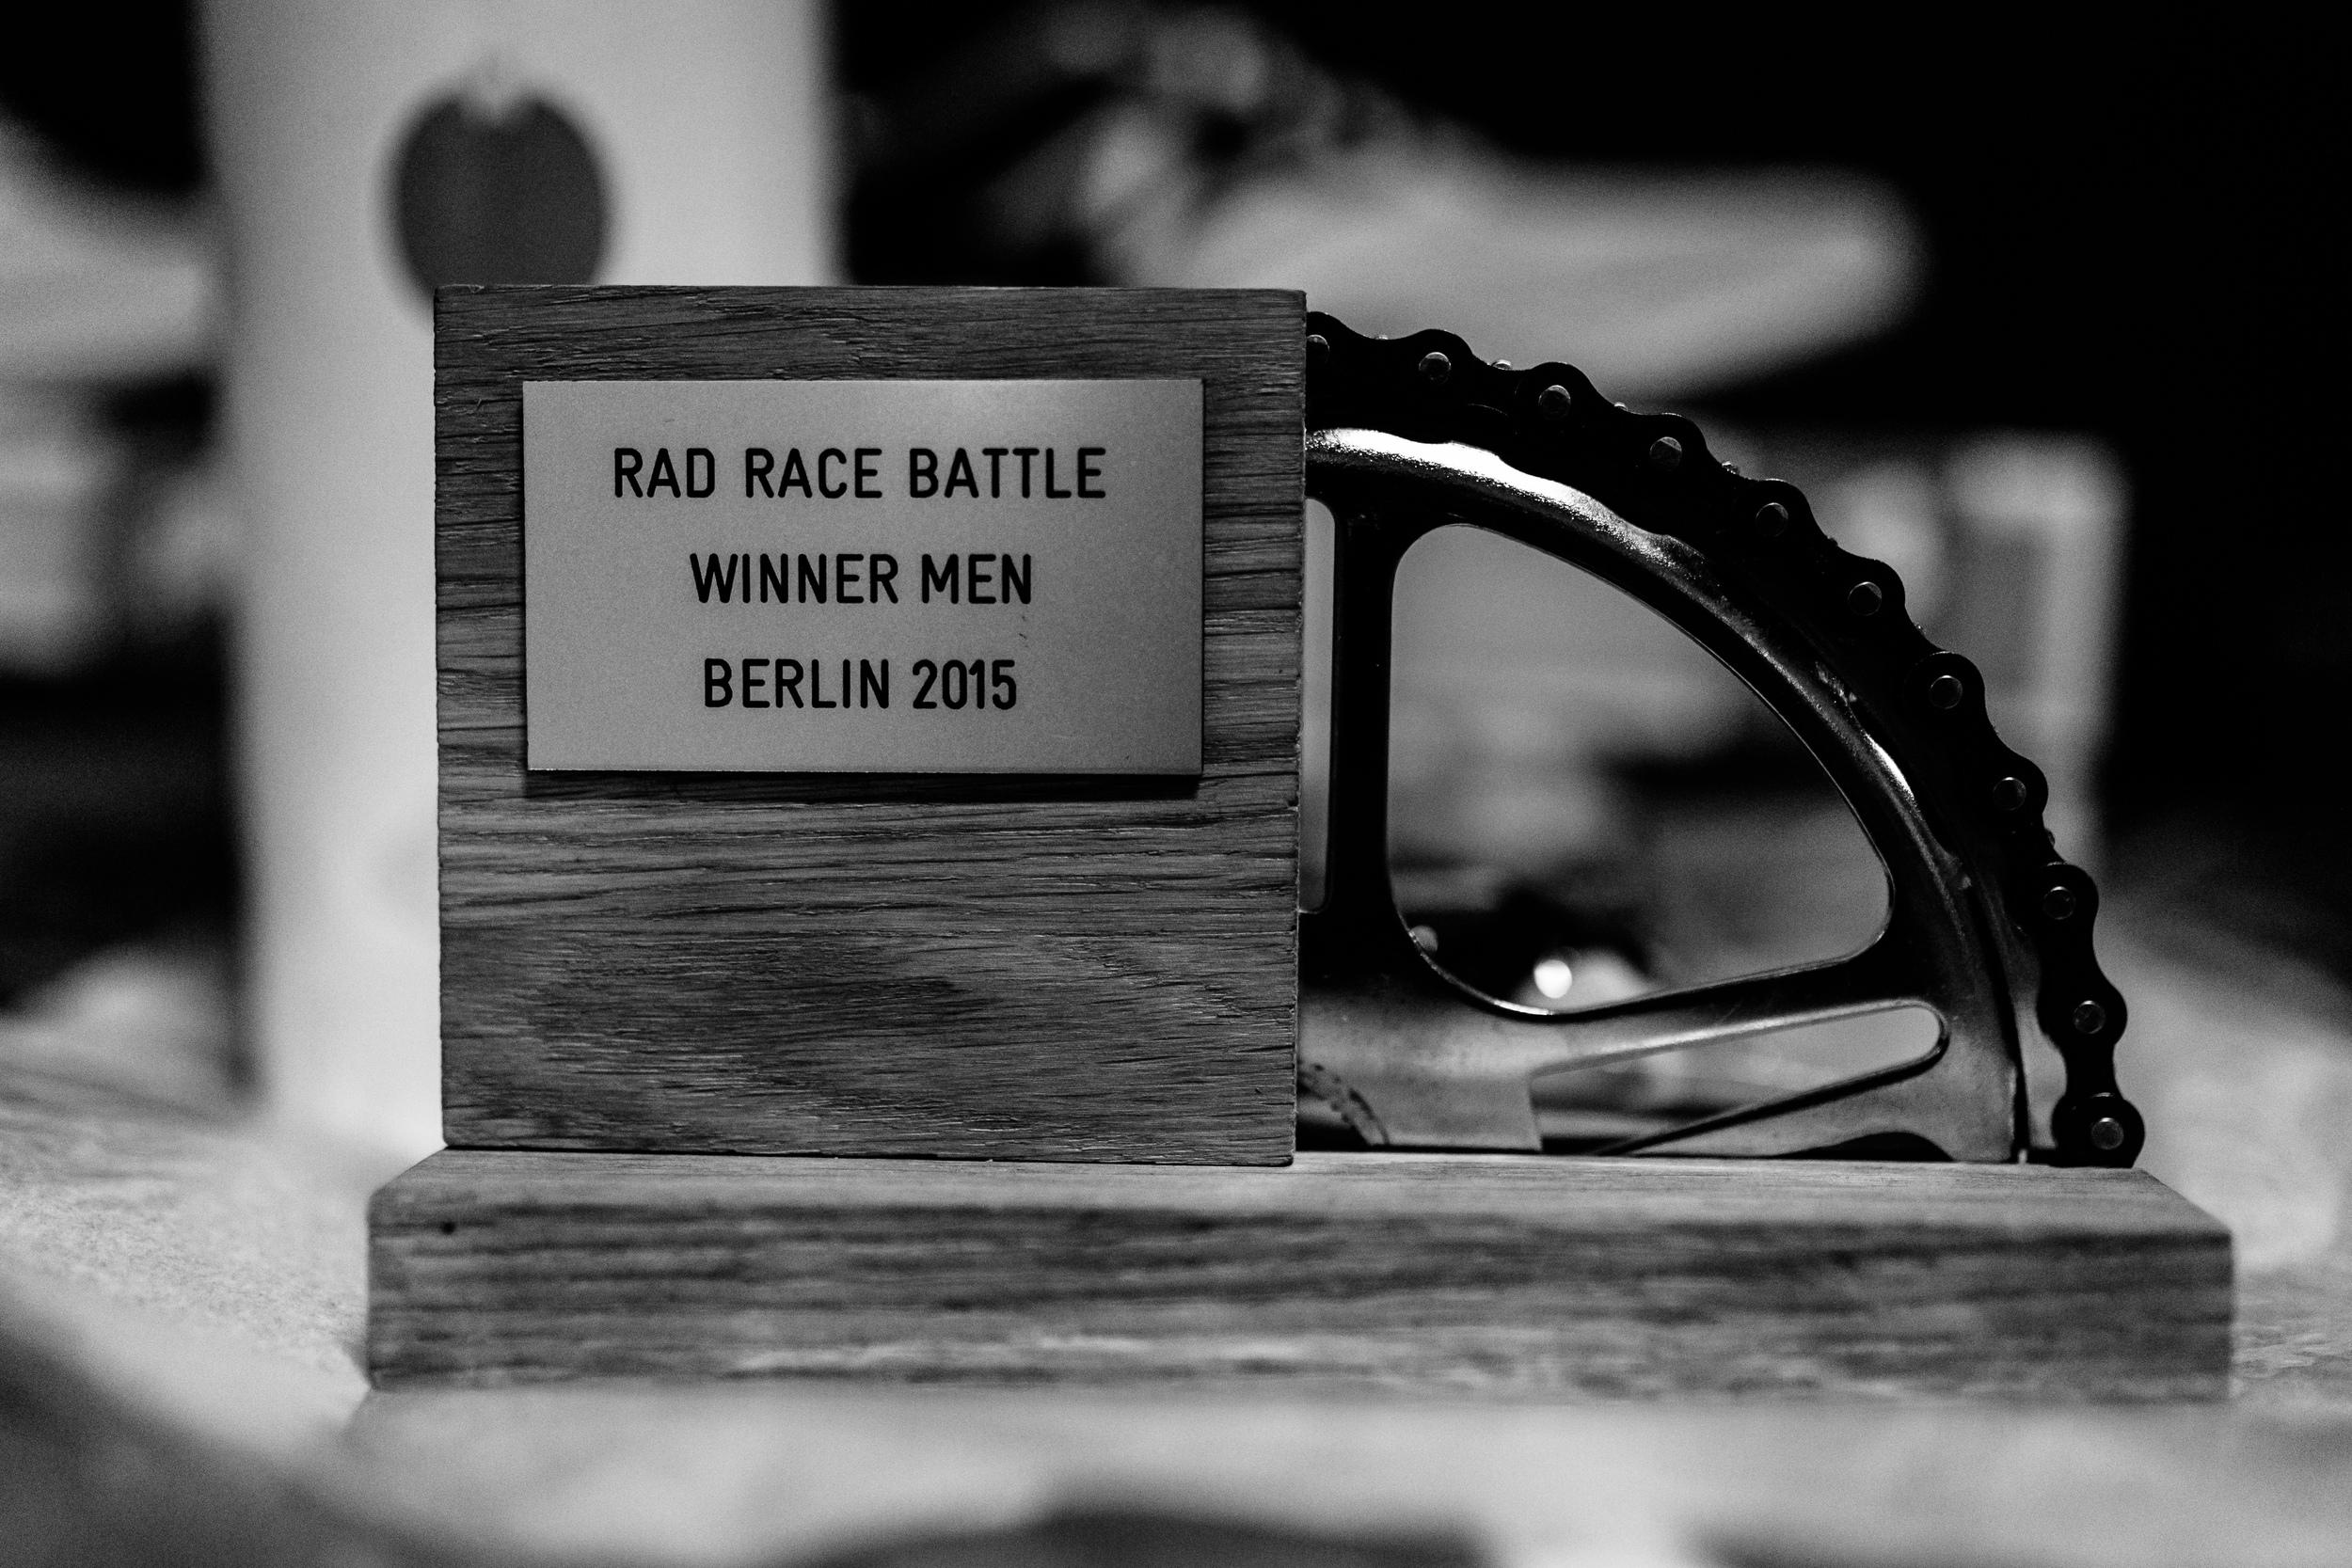 20150320_LEXIUS_RADRACE_BATTLE_BERLIN_0003.jpg